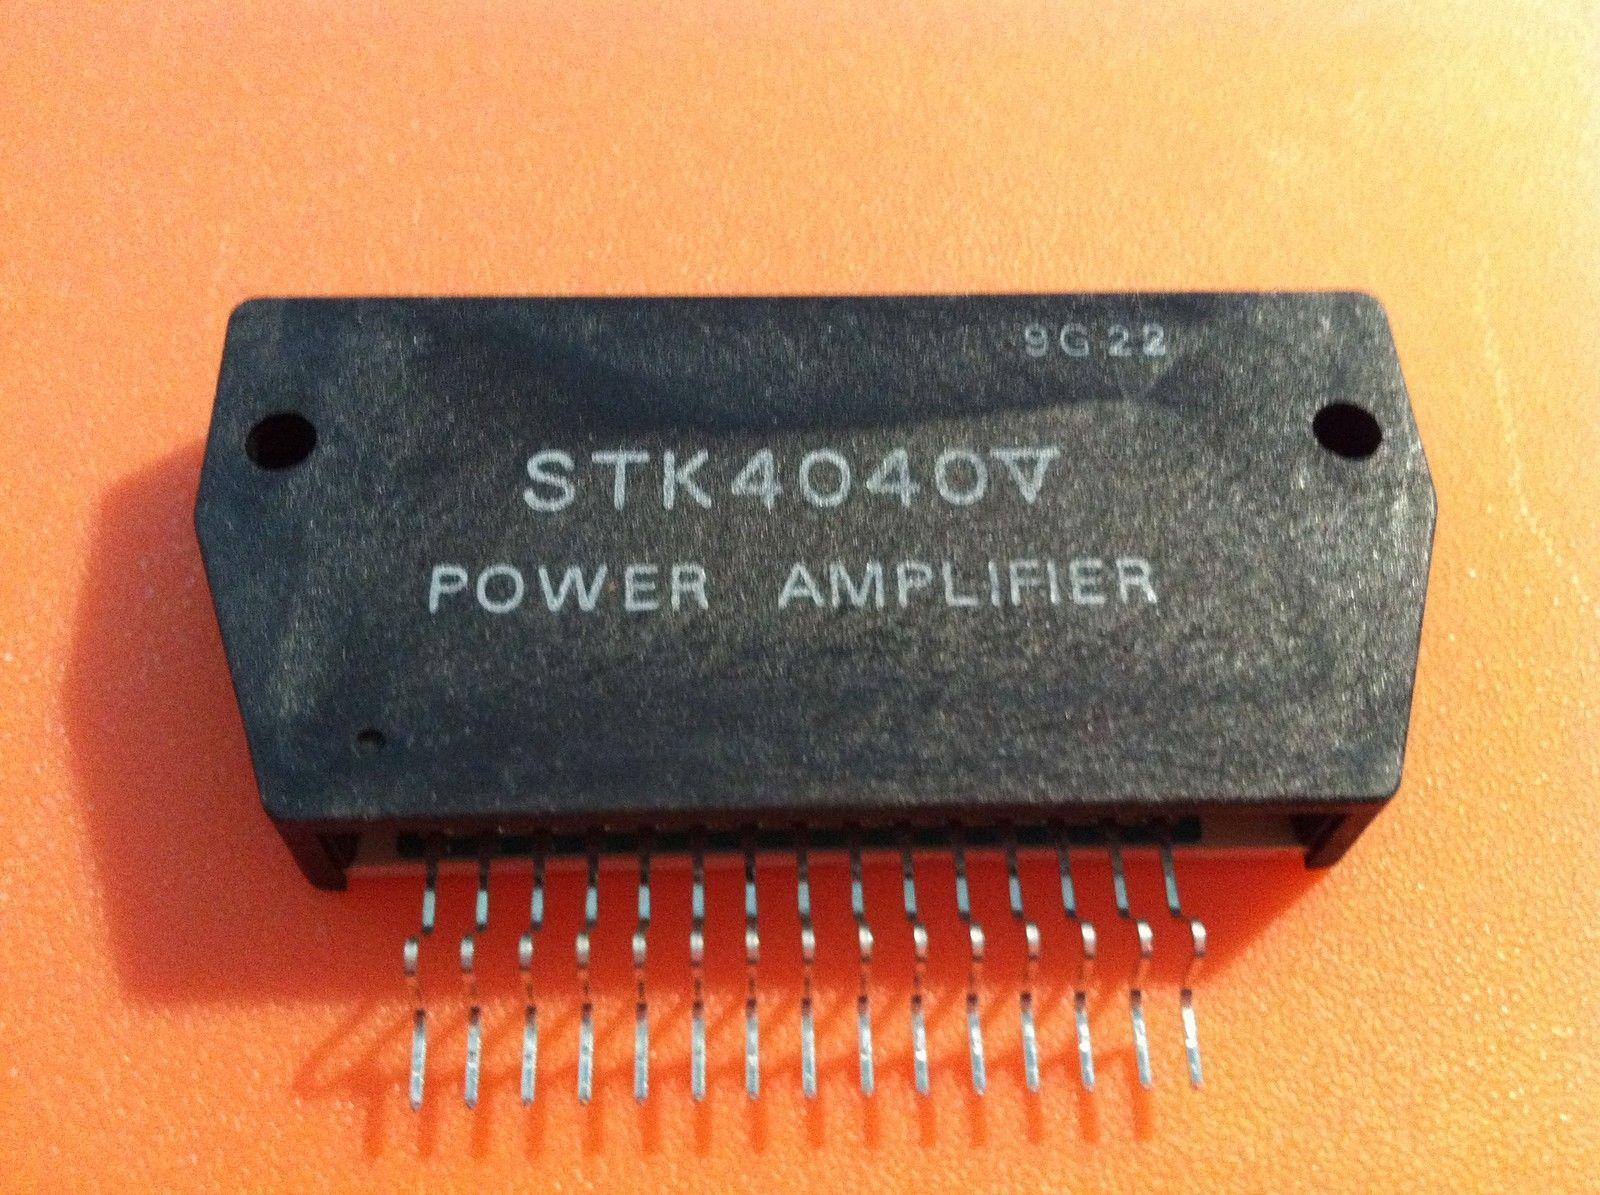 Stk4040 V Af Power Amplifier 70 W By Sanyo And 50 Similar Items 70w Fm Stk4040v Heat Sink Compound